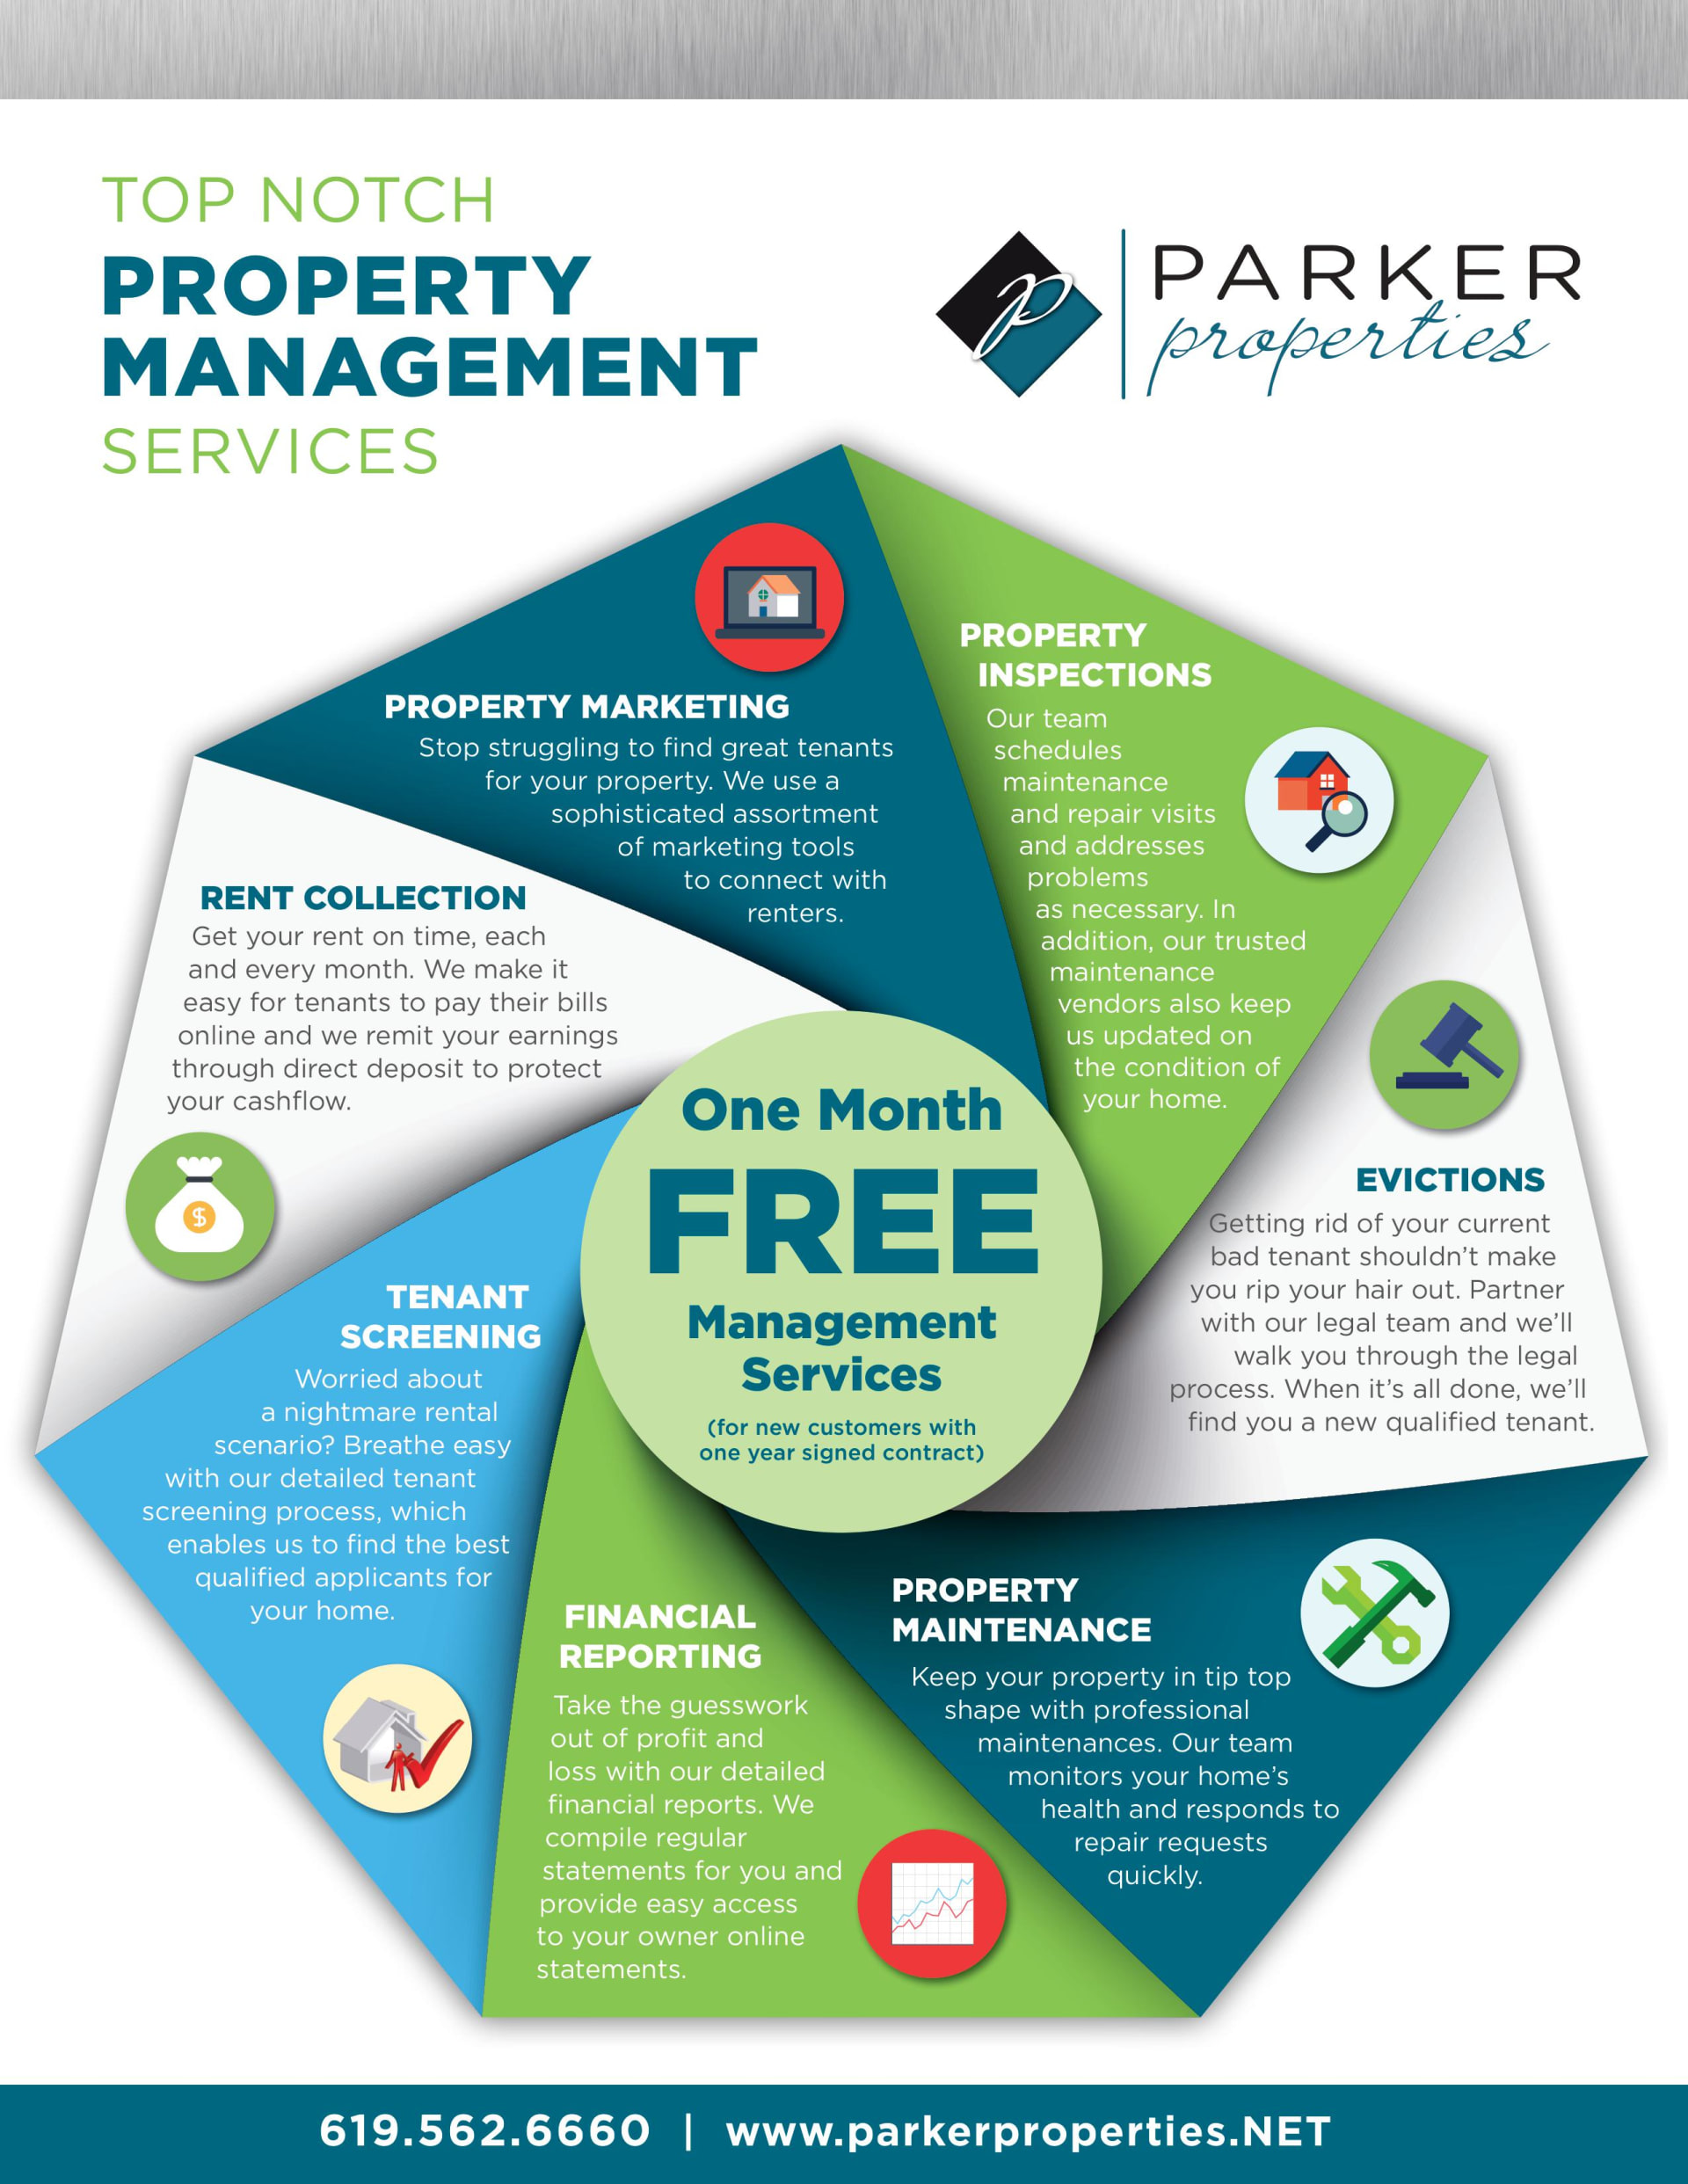 Parker-Properties-Flyer-updated-3-21-18.JPEG-w1920.jpg